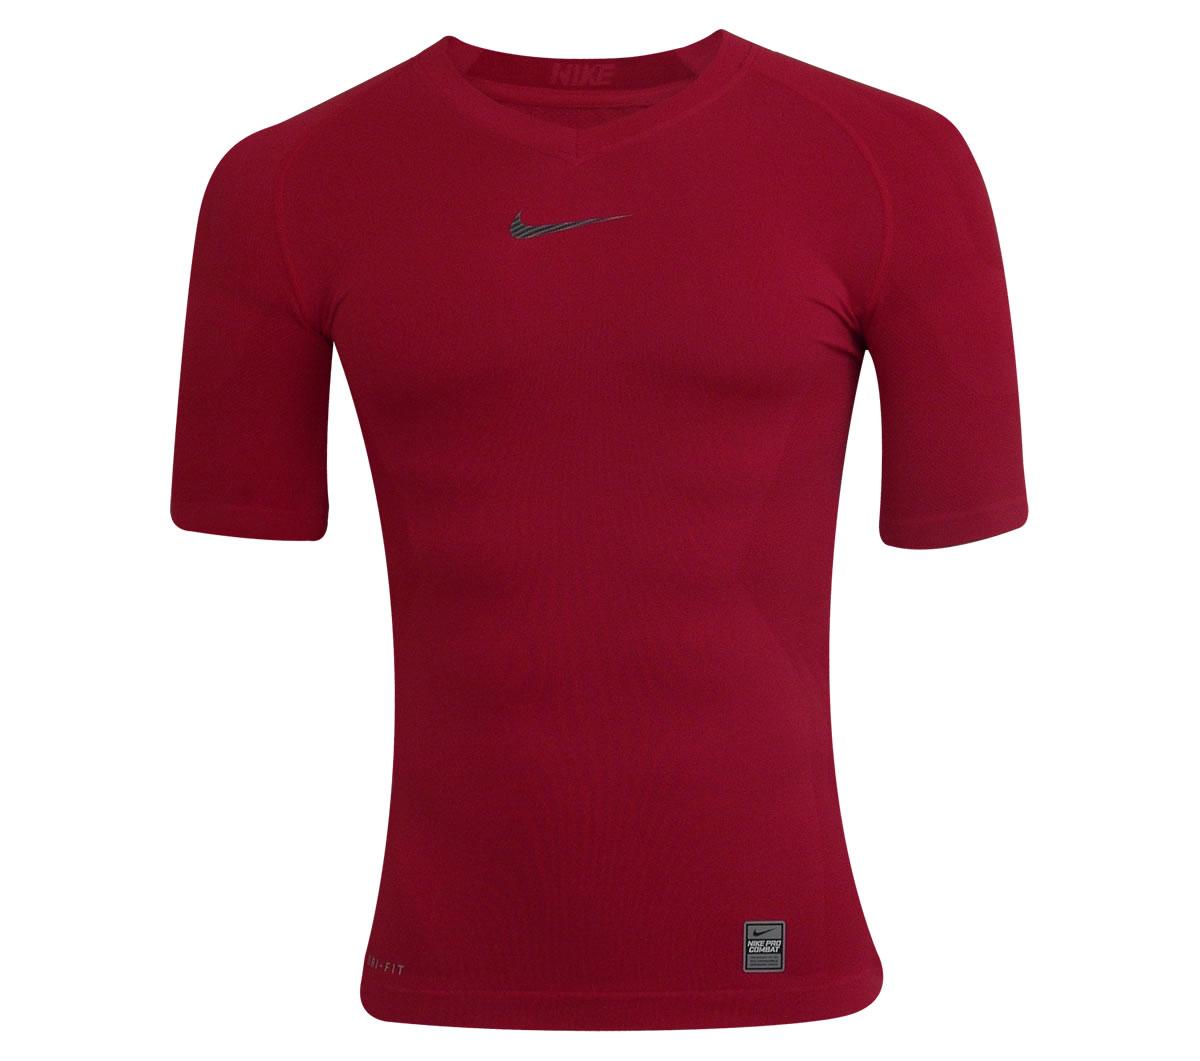 Camisa Nike Pro Core Hypercool Manga Curta Vermelha - Mundo do Futebol 31f9326f370e7